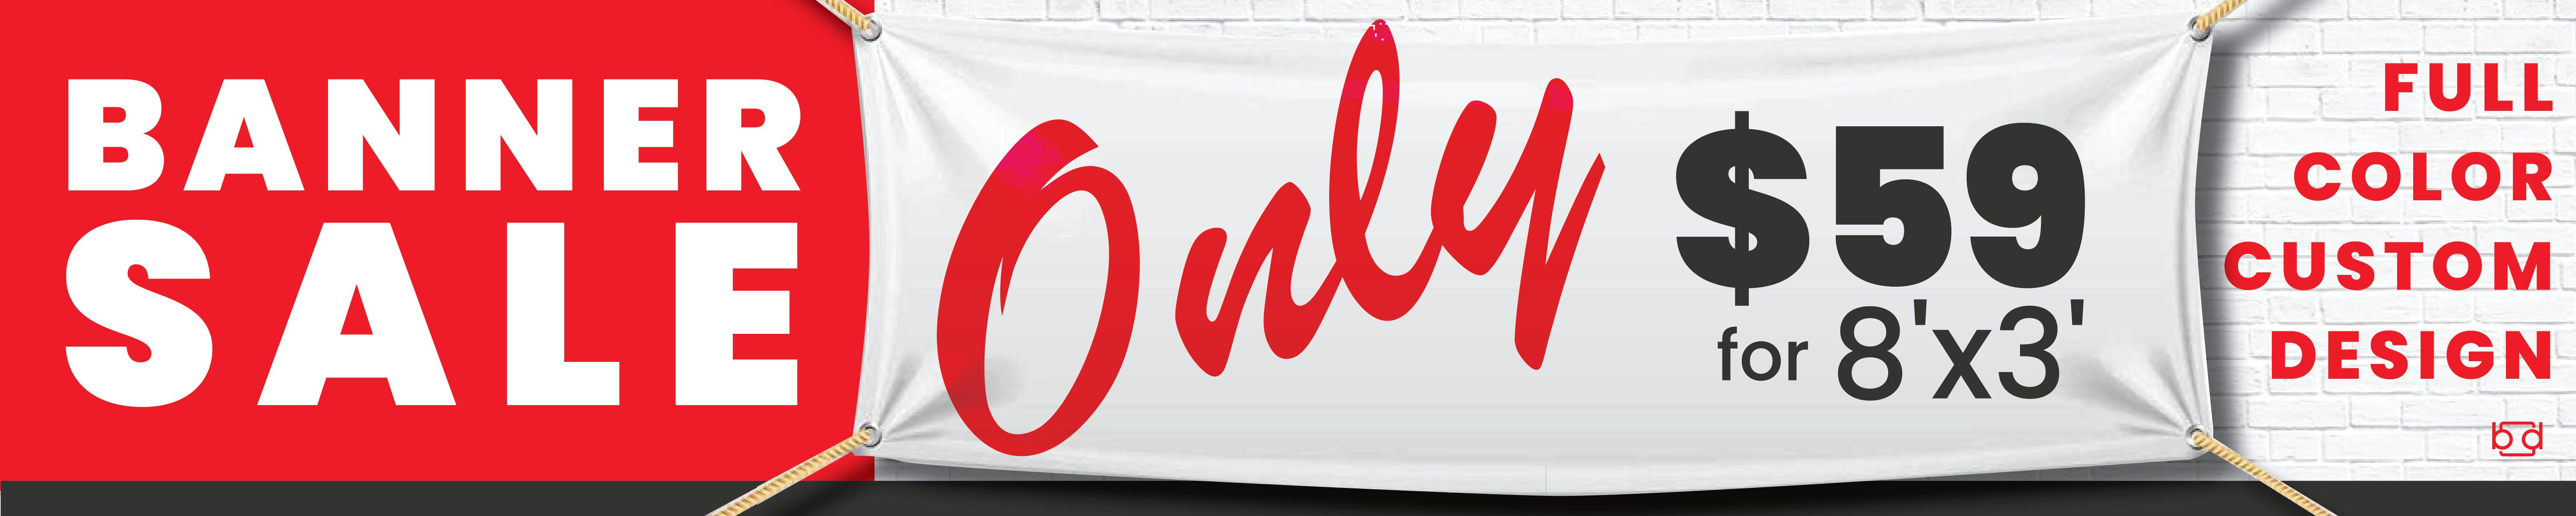 Banner Sale, Cheap Custom Banners Reno